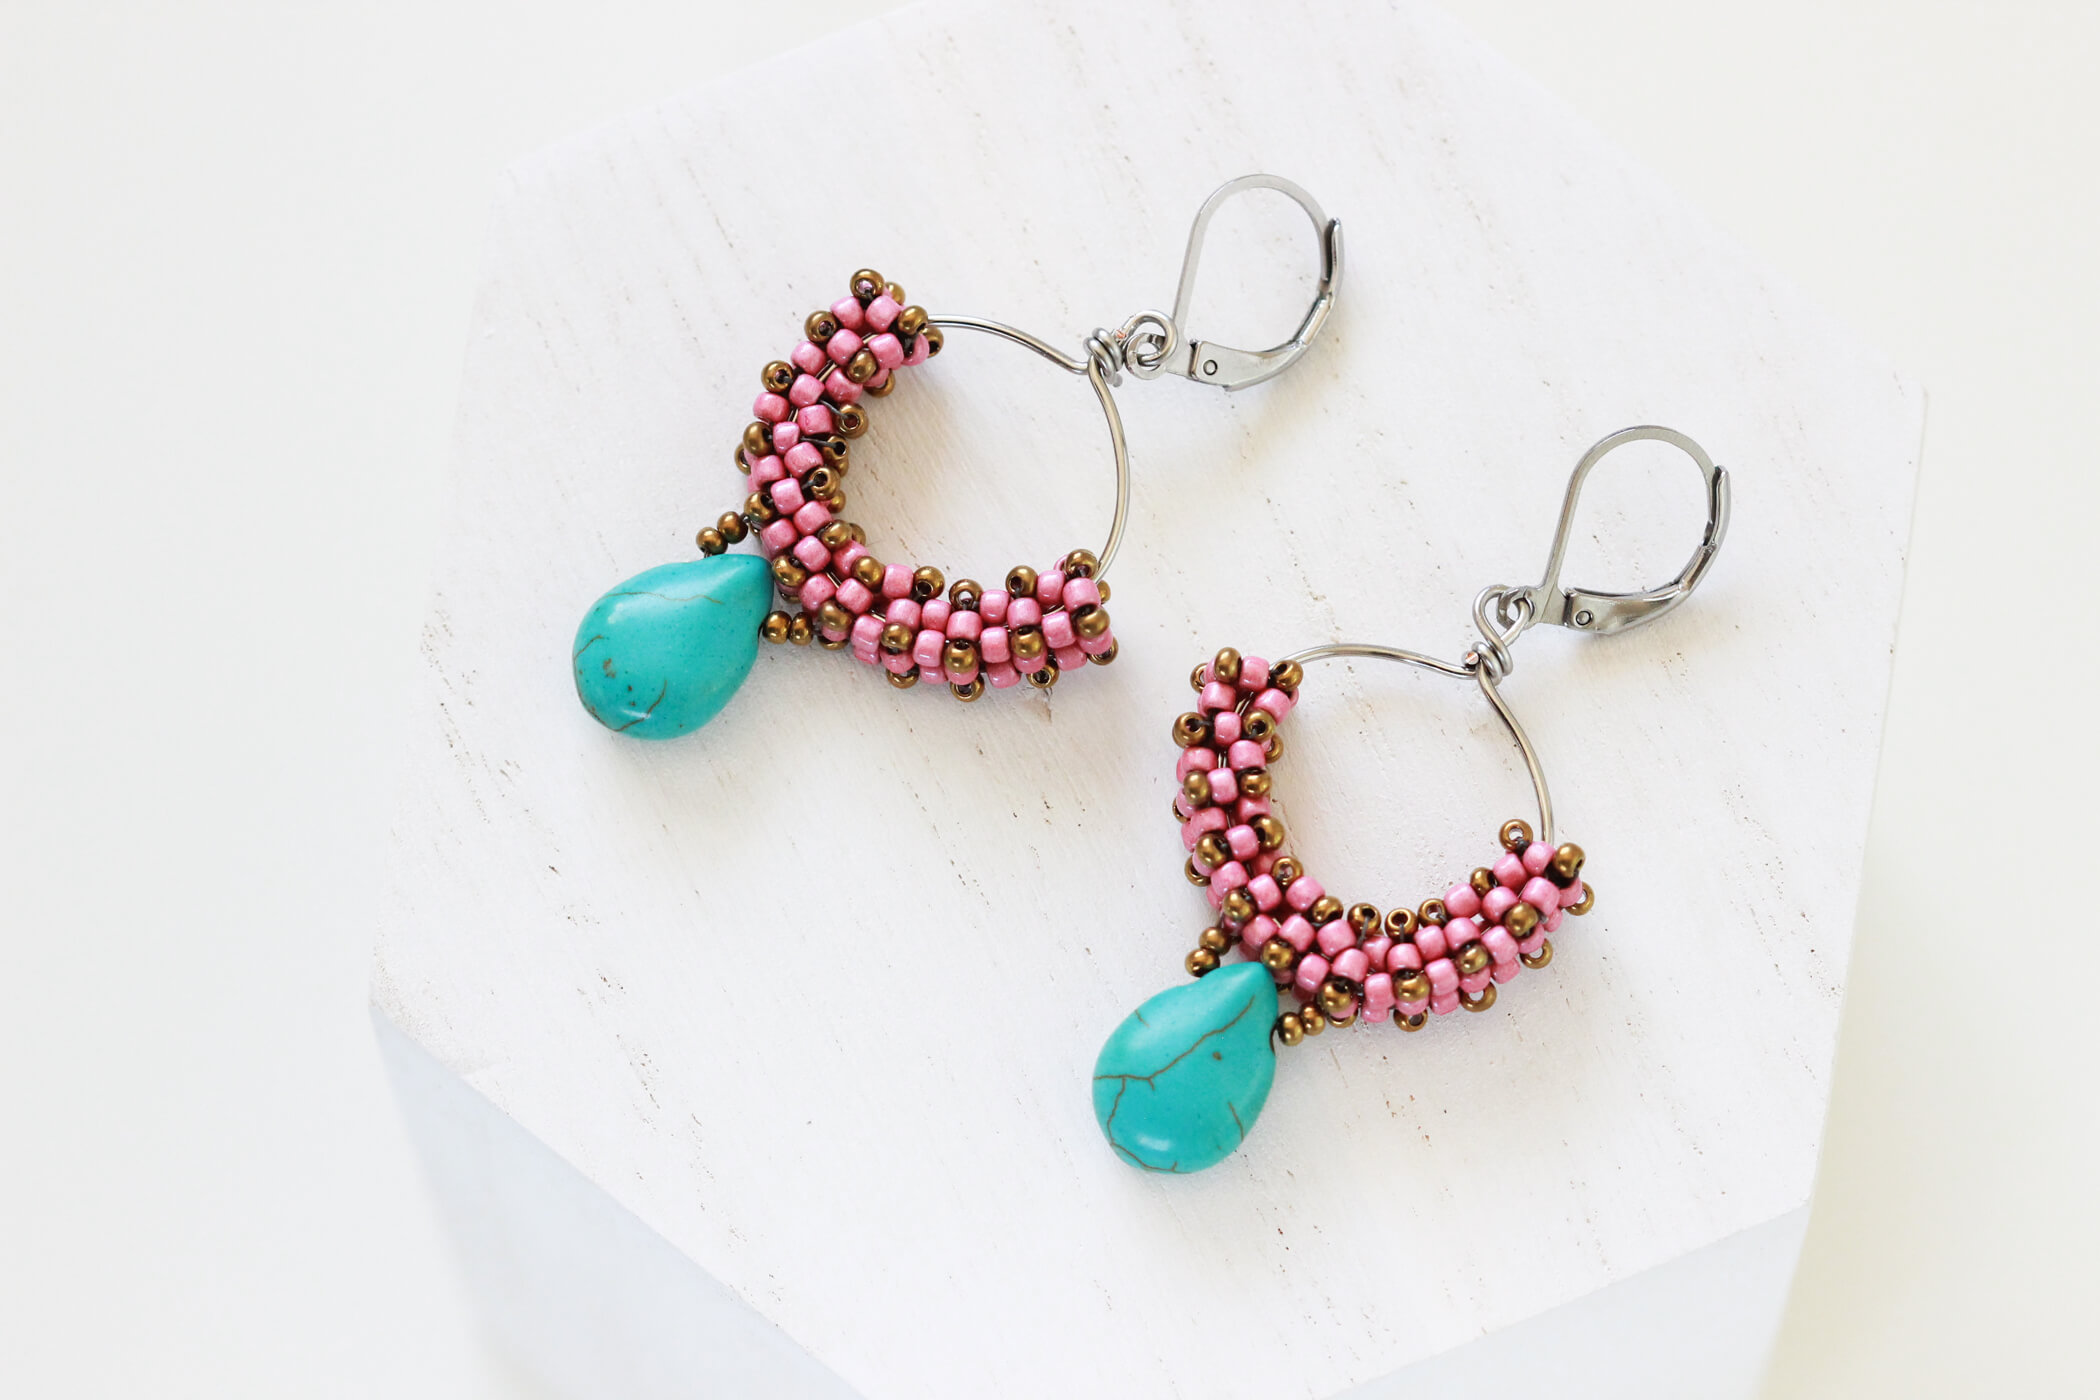 Turquoise Beaded Earrings – Beaded Hoop Earrings by Kaleidoscopes And Polka Dots